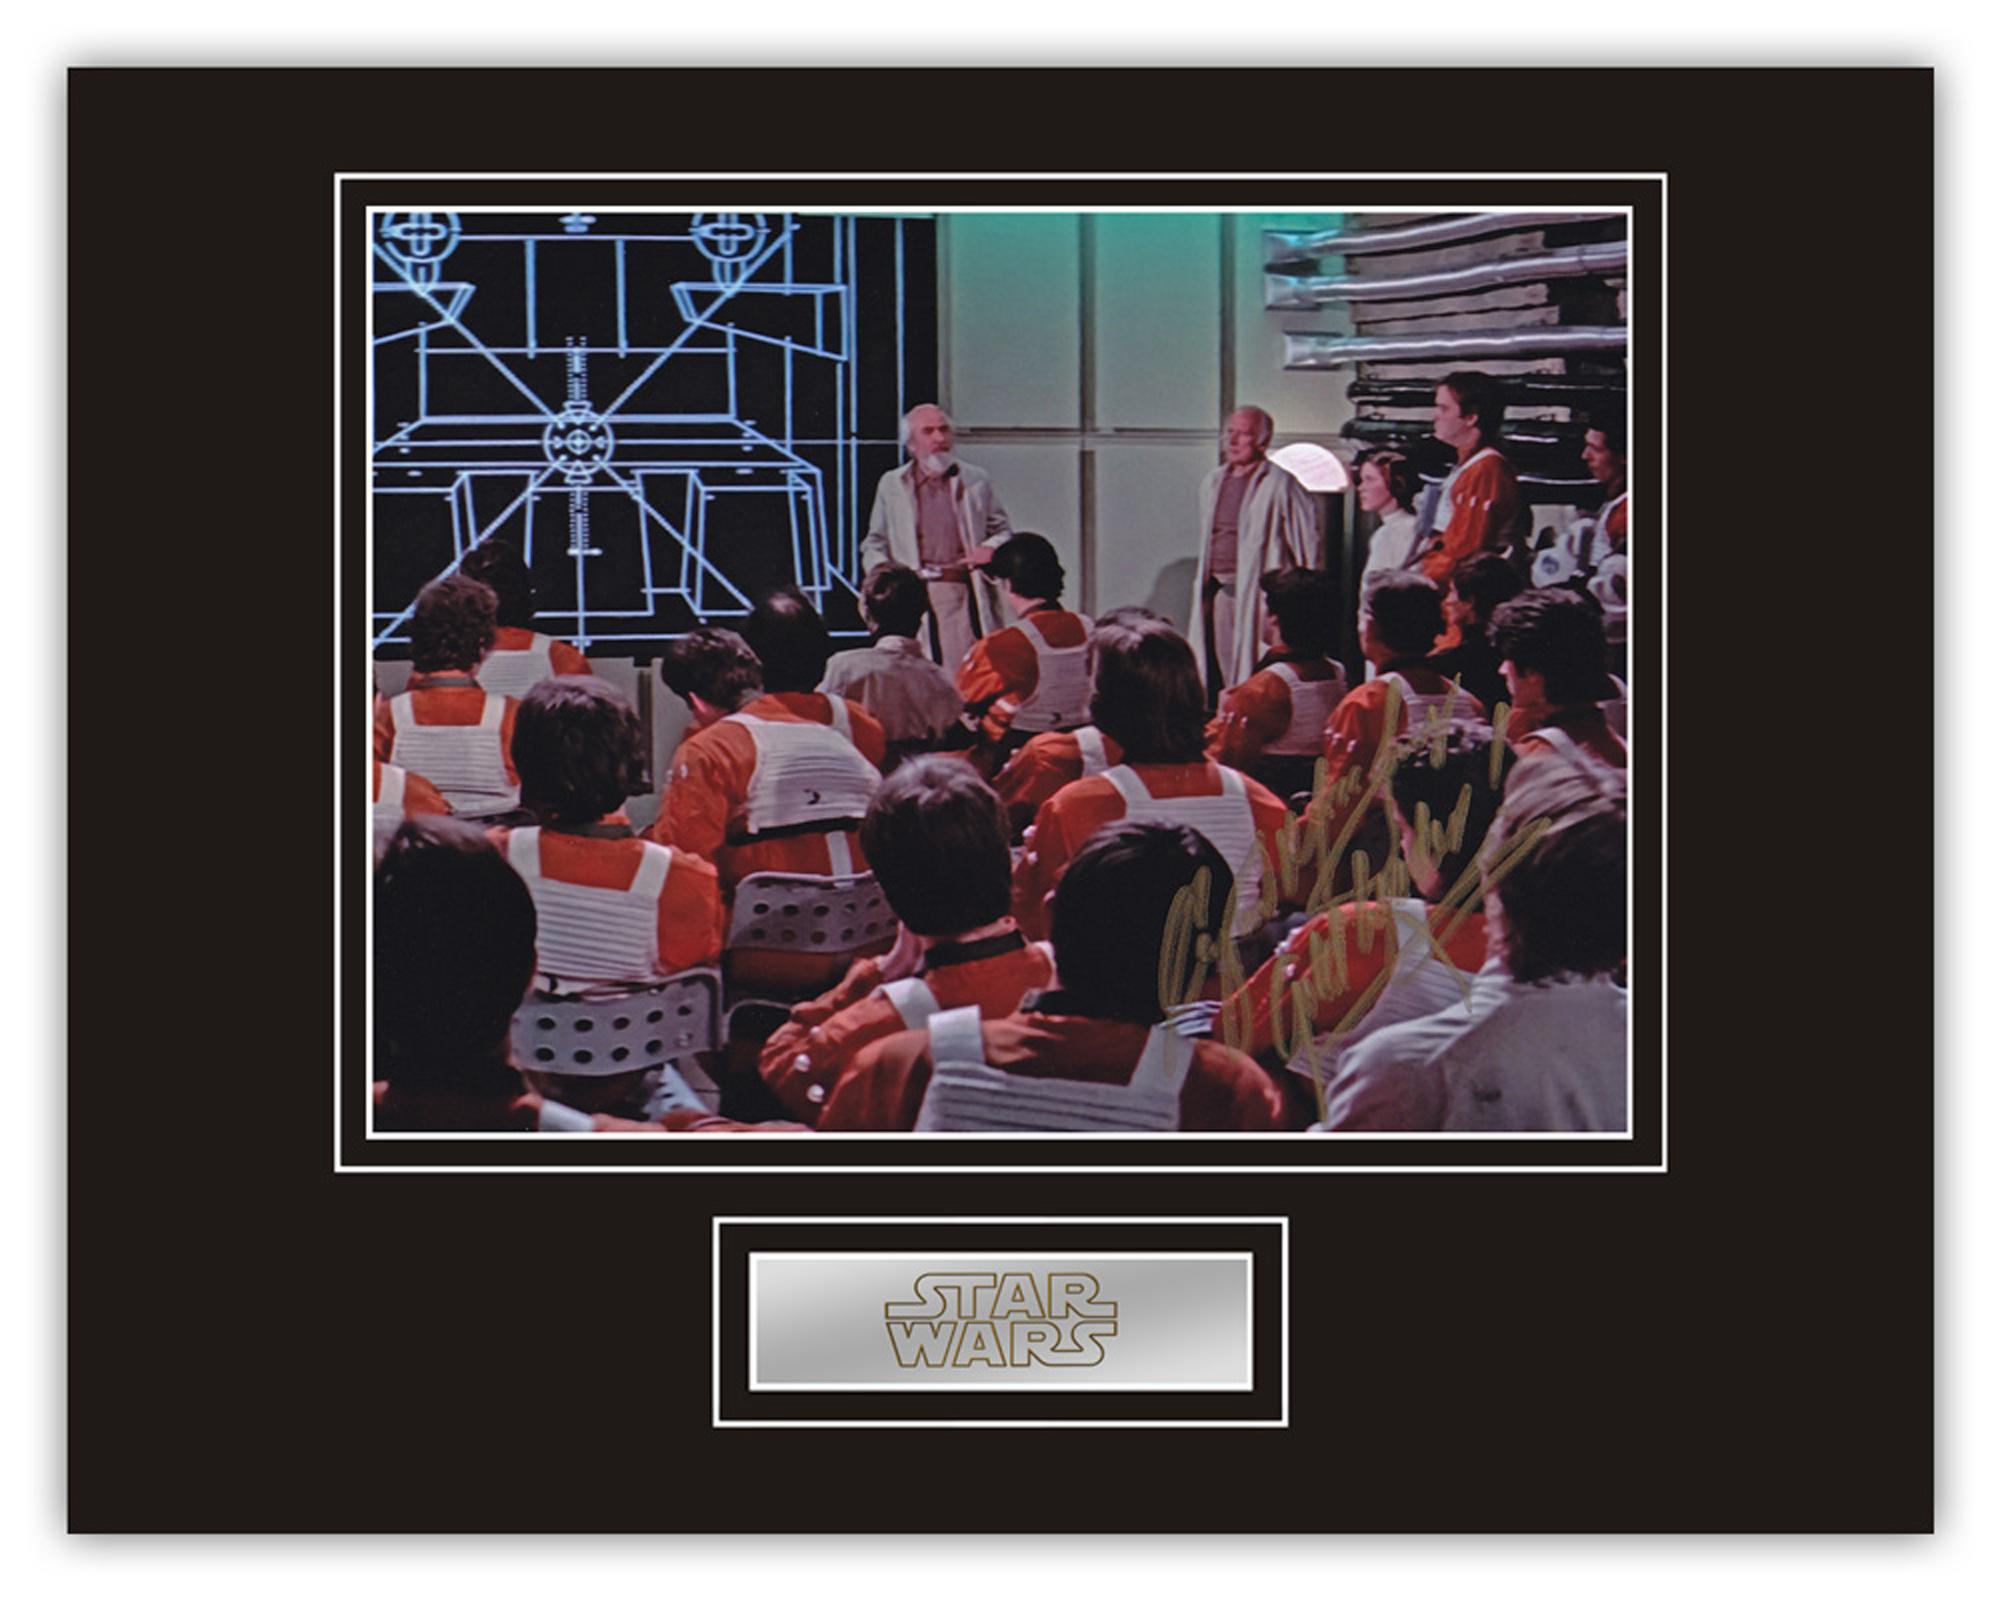 Stunning Display! Star Wars Angus MacInnes hand signed professionally mounted display. This